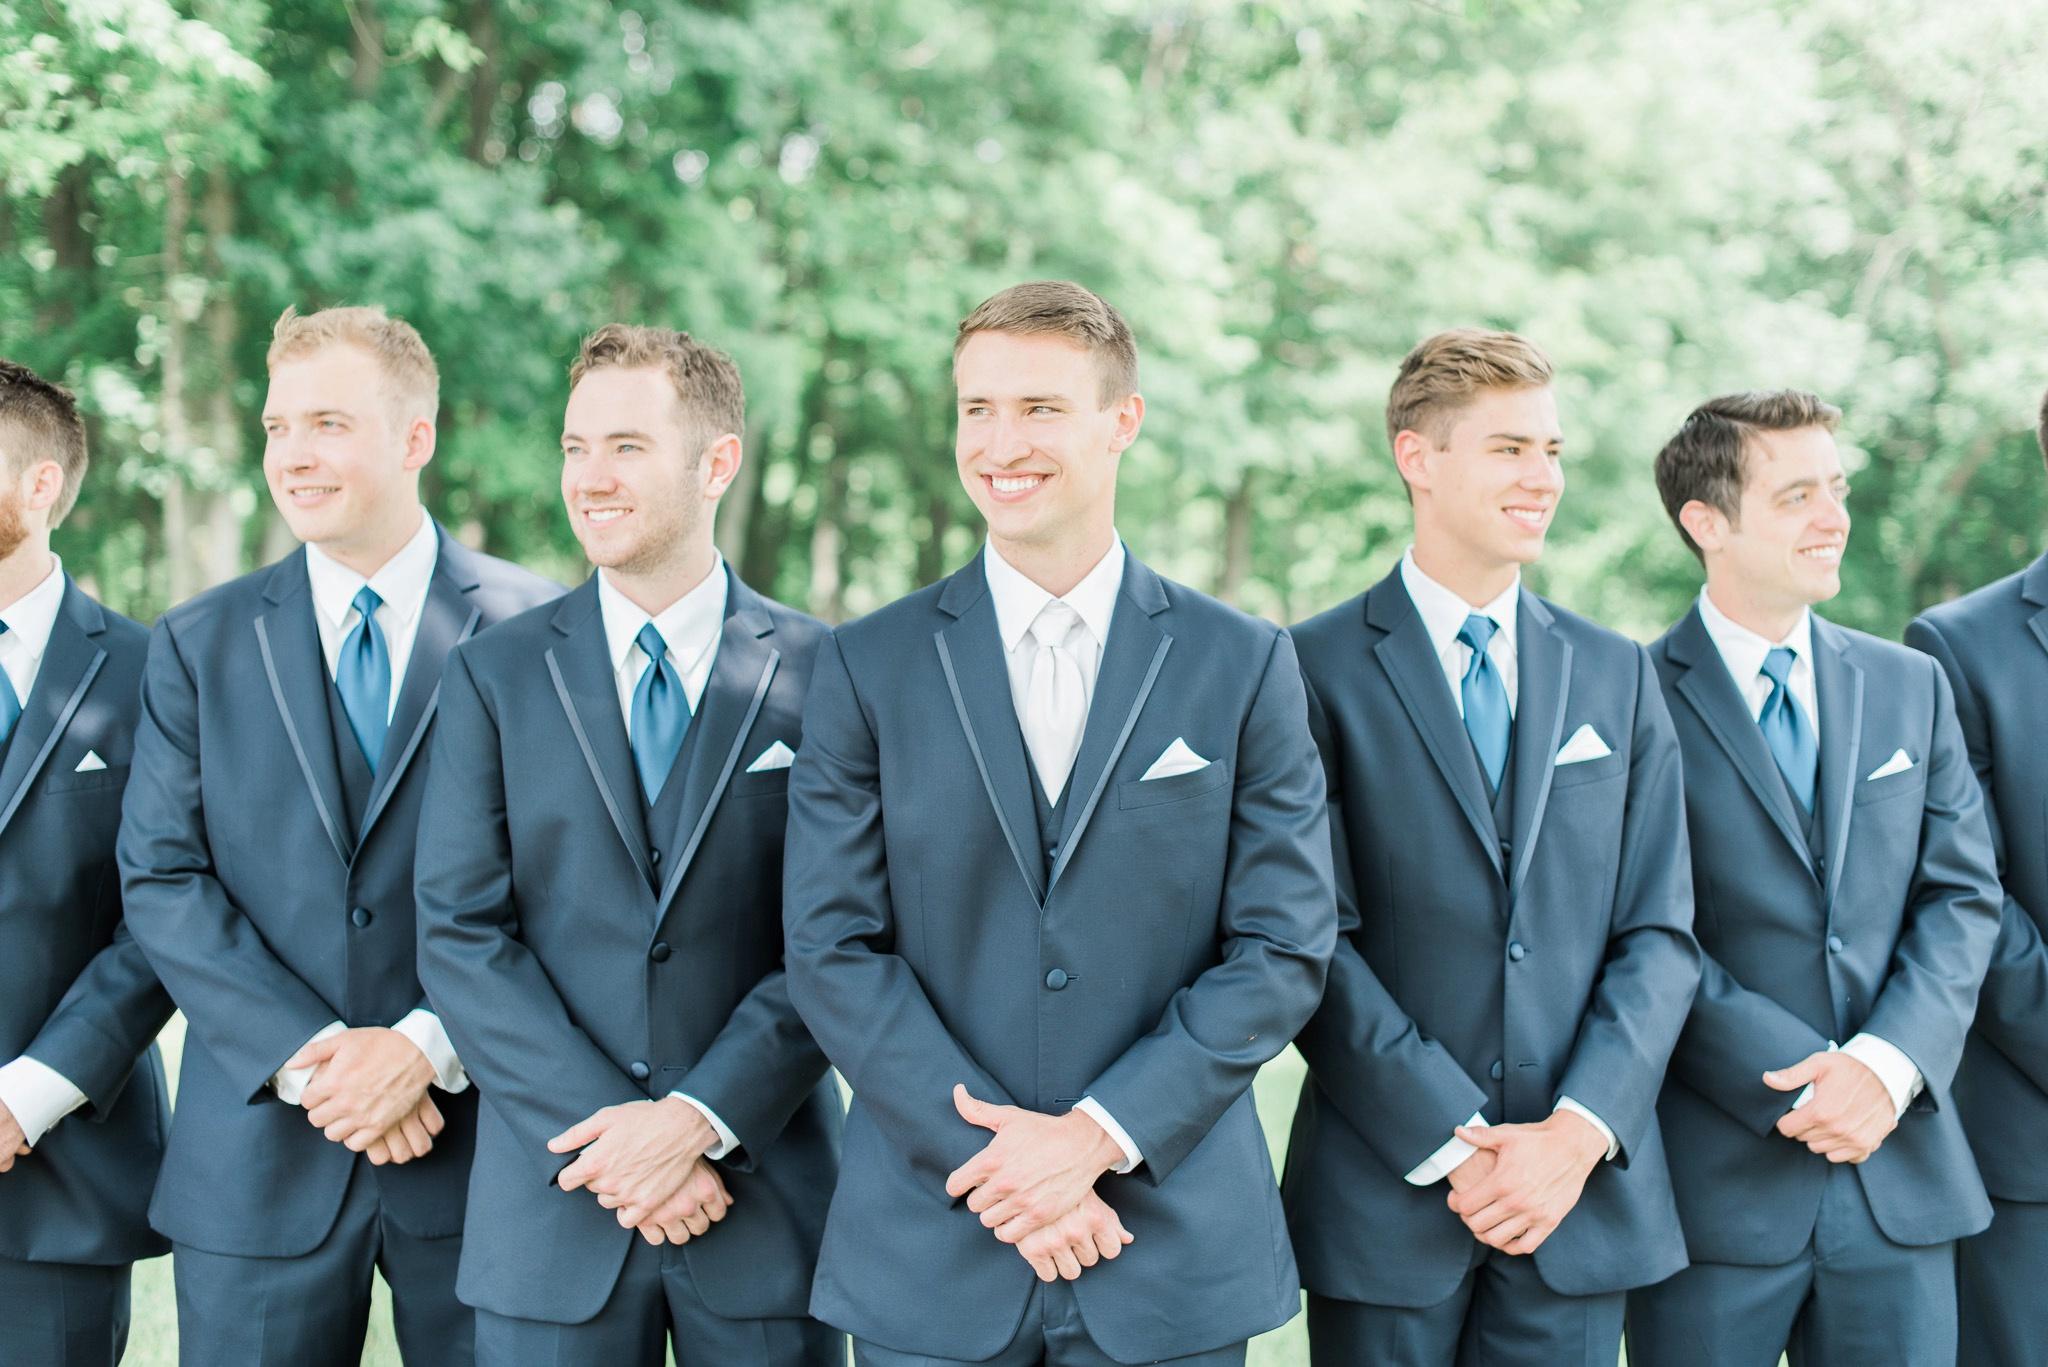 sunbury-ohio-wedding-hannah-johnathan_0049.jpg